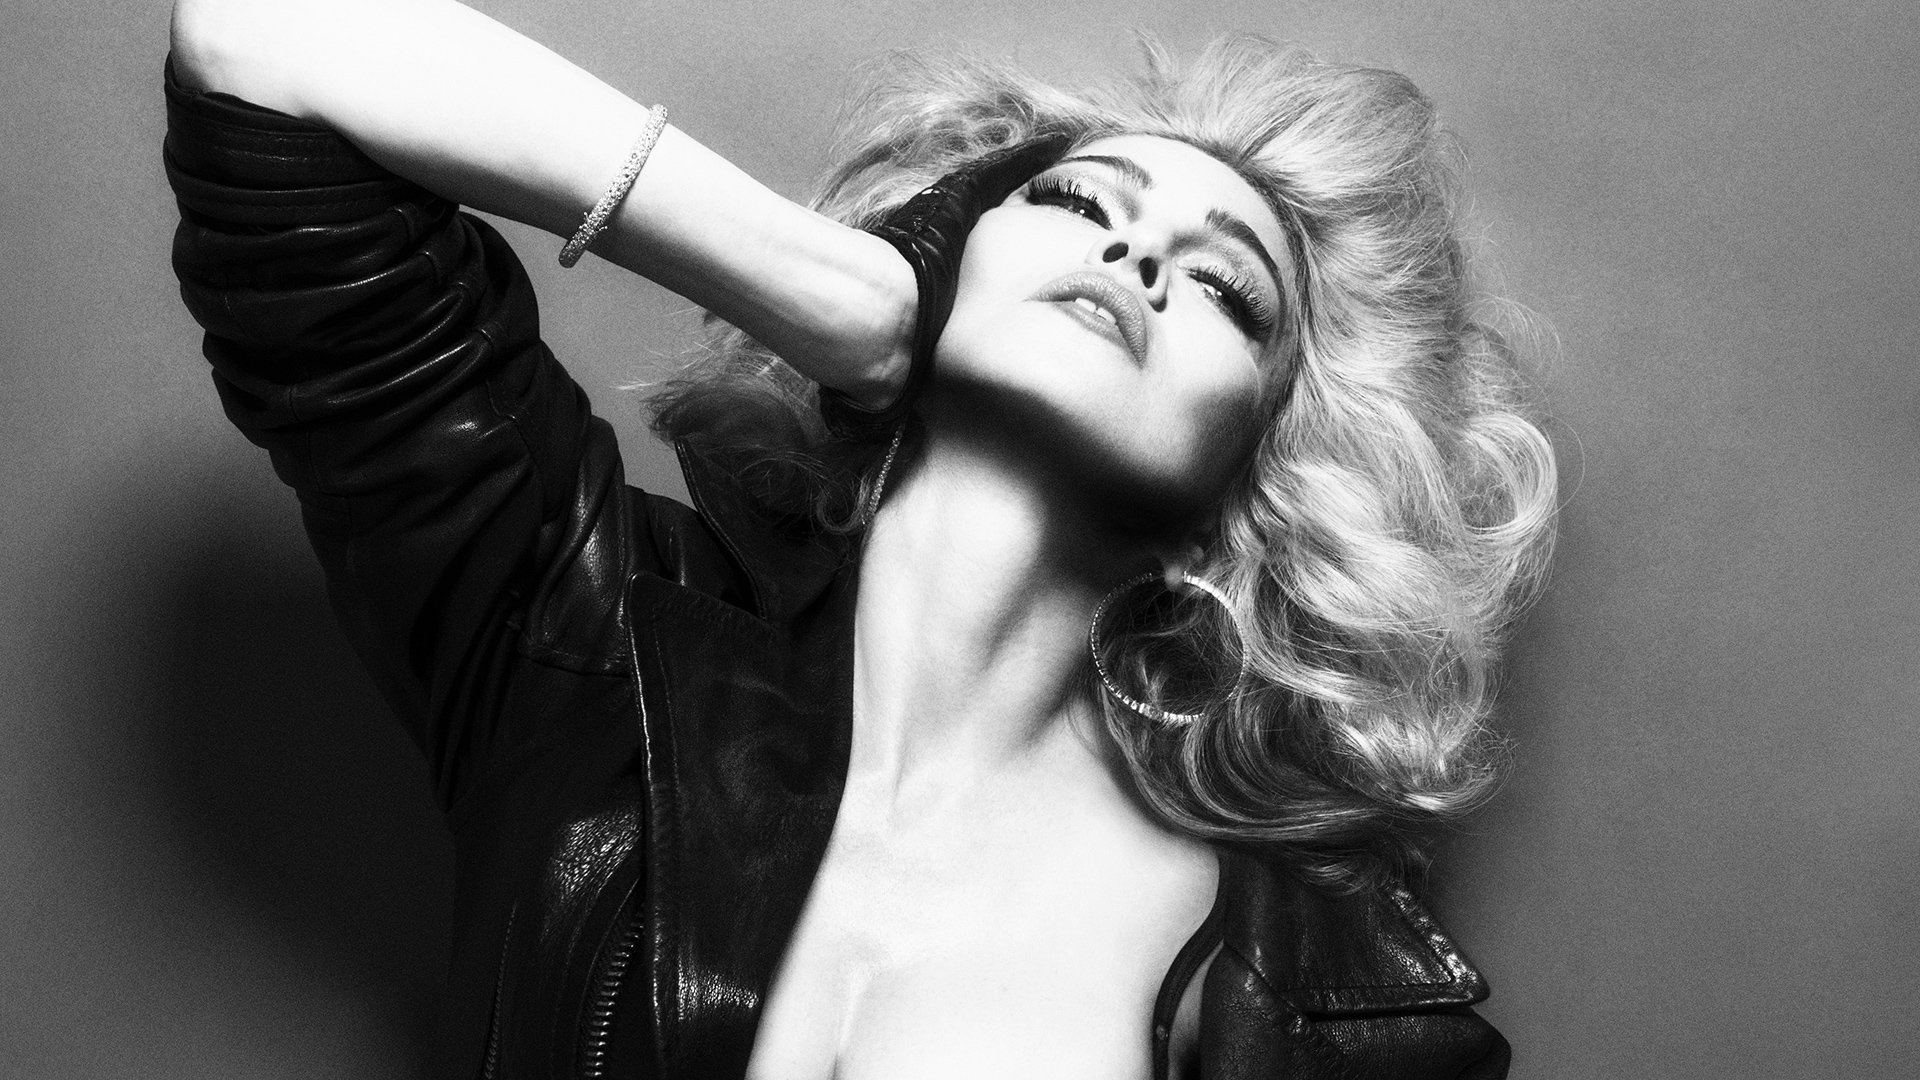 Madonna hd wallpaper background image 1920x1080 id 545502 wallpaper abyss - Madonna hd images ...